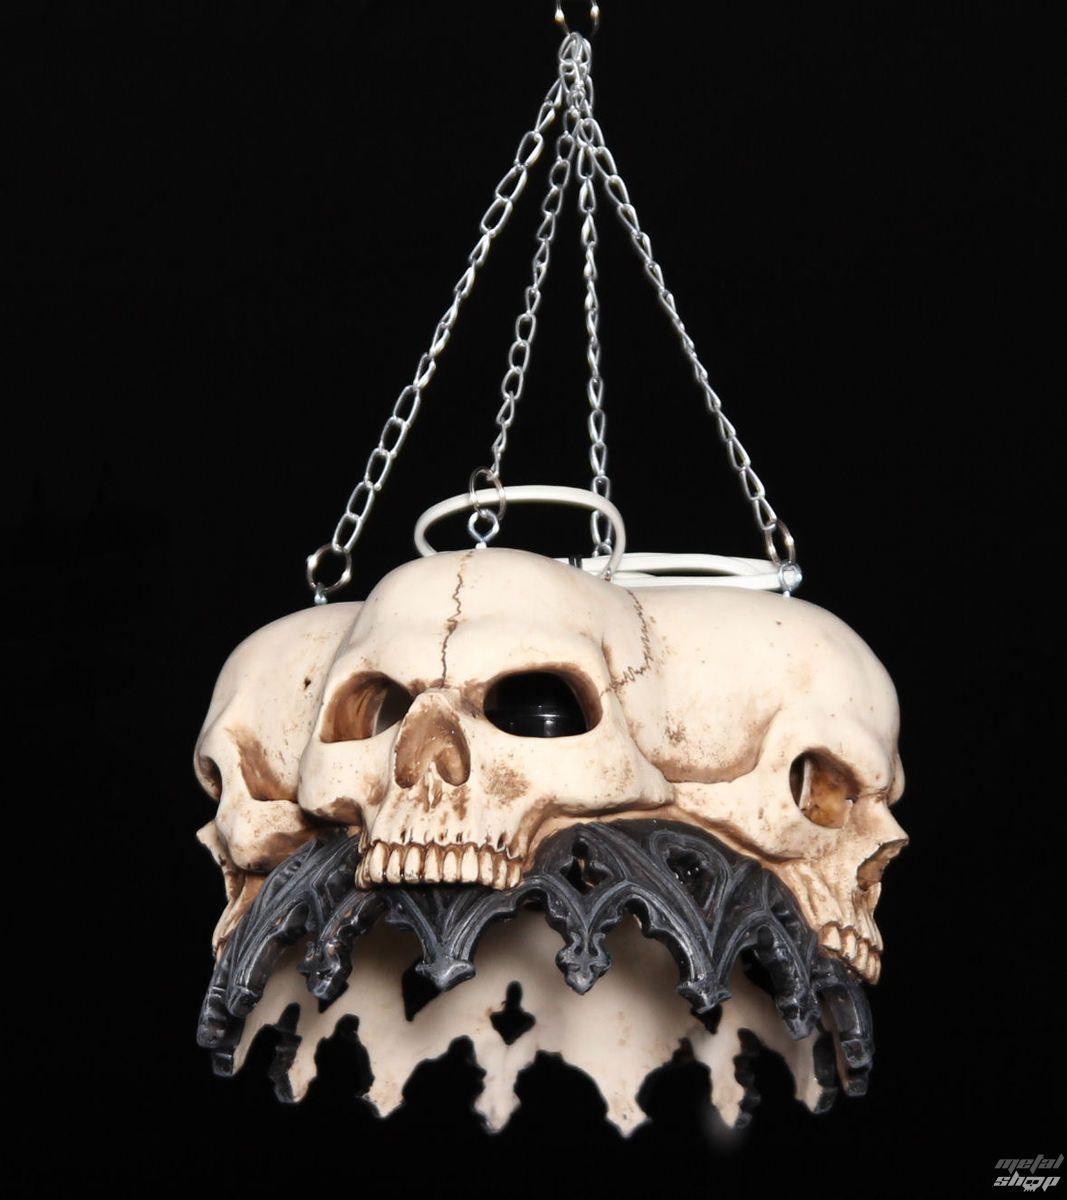 gothic dragon furniture lamp ceiling skull gothic 766 9039 metal in my black. Black Bedroom Furniture Sets. Home Design Ideas